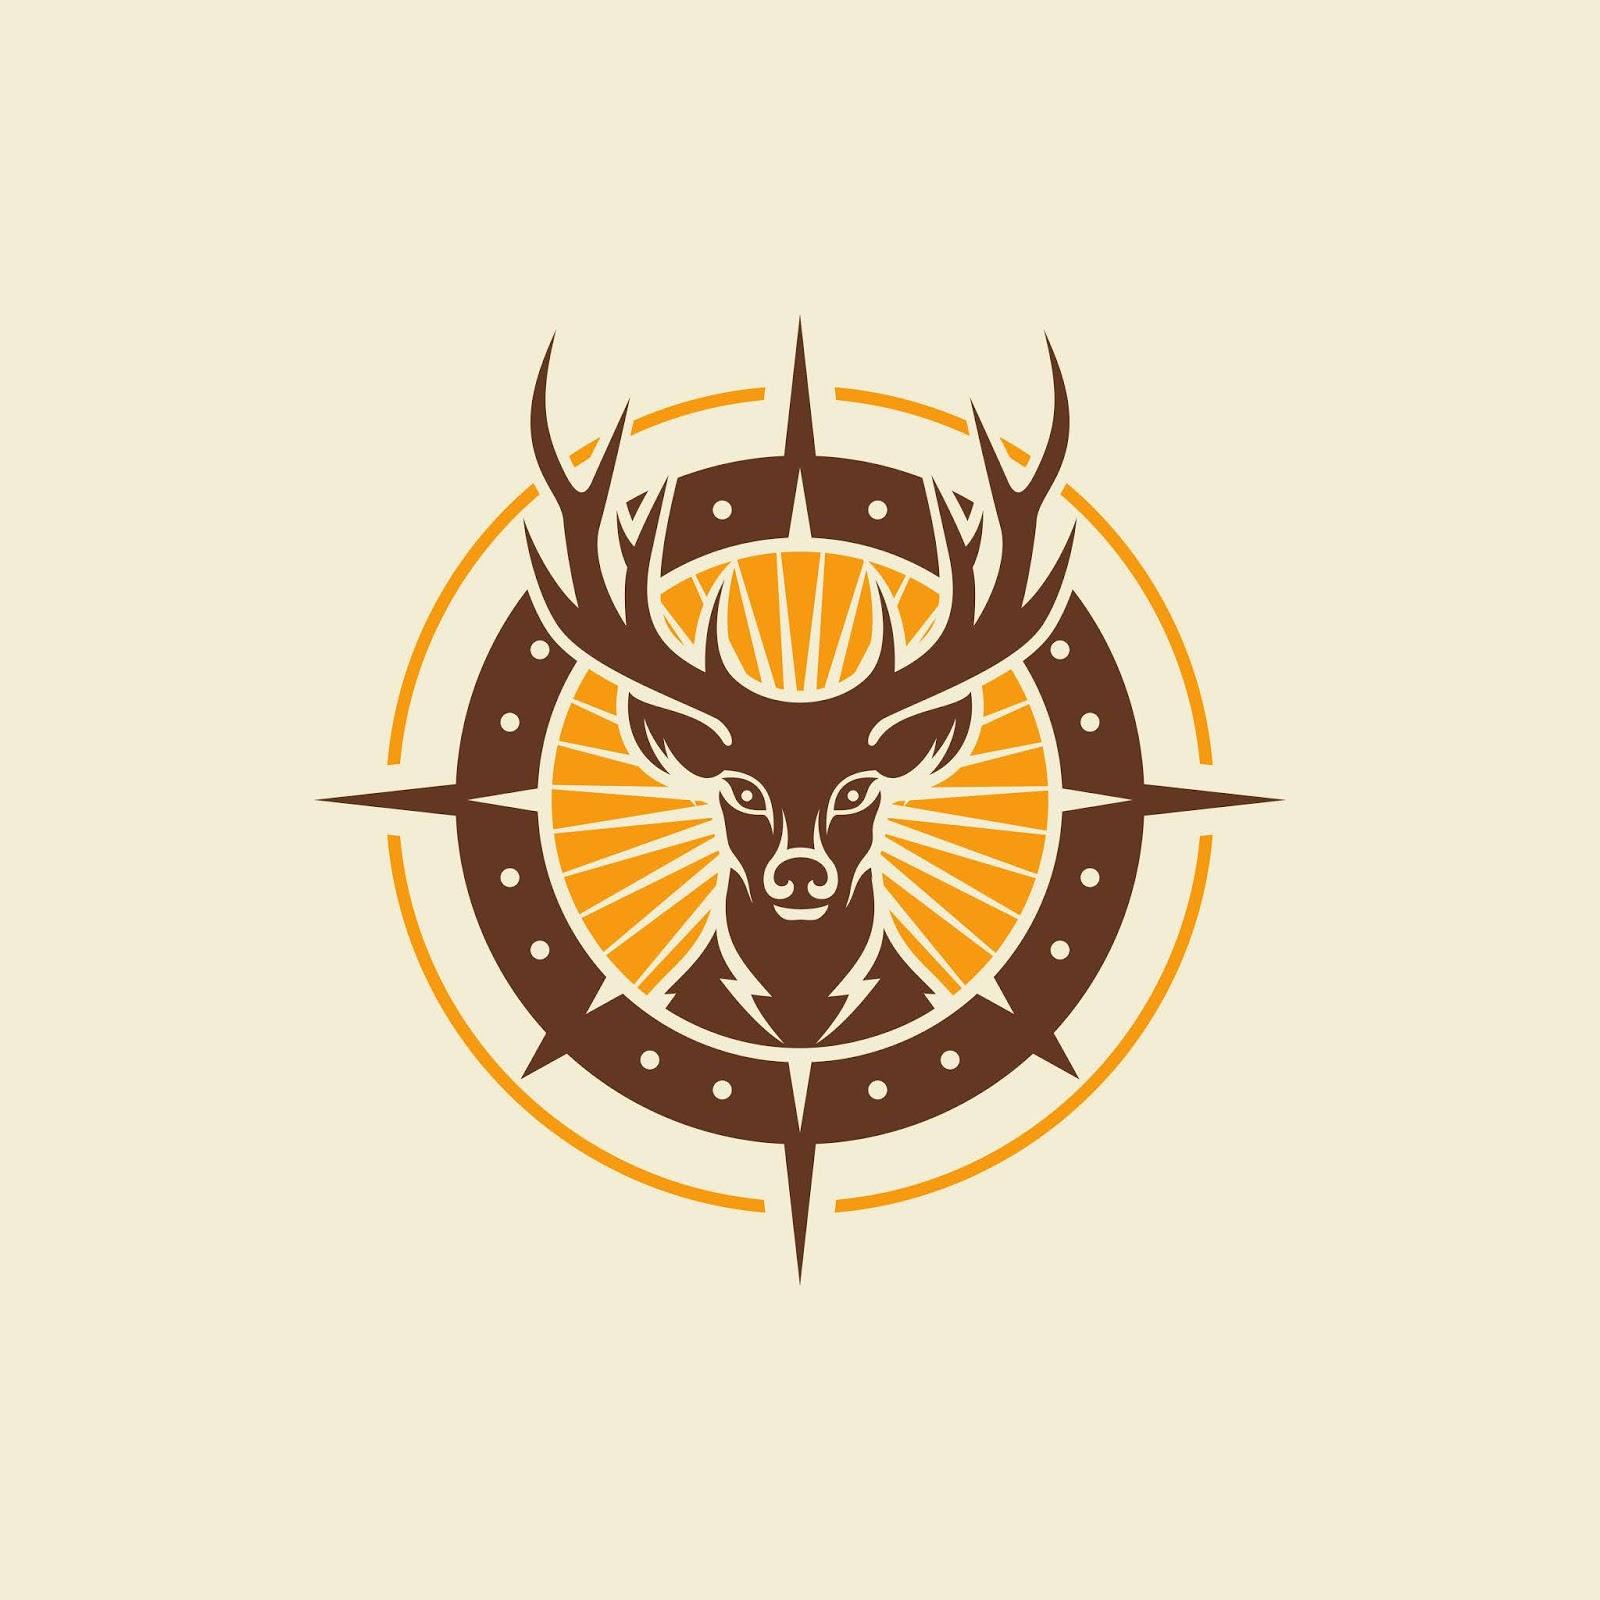 Wild Deer Vintage Logo Design Vector Free Download Vector CDR, AI, EPS and PNG Formats